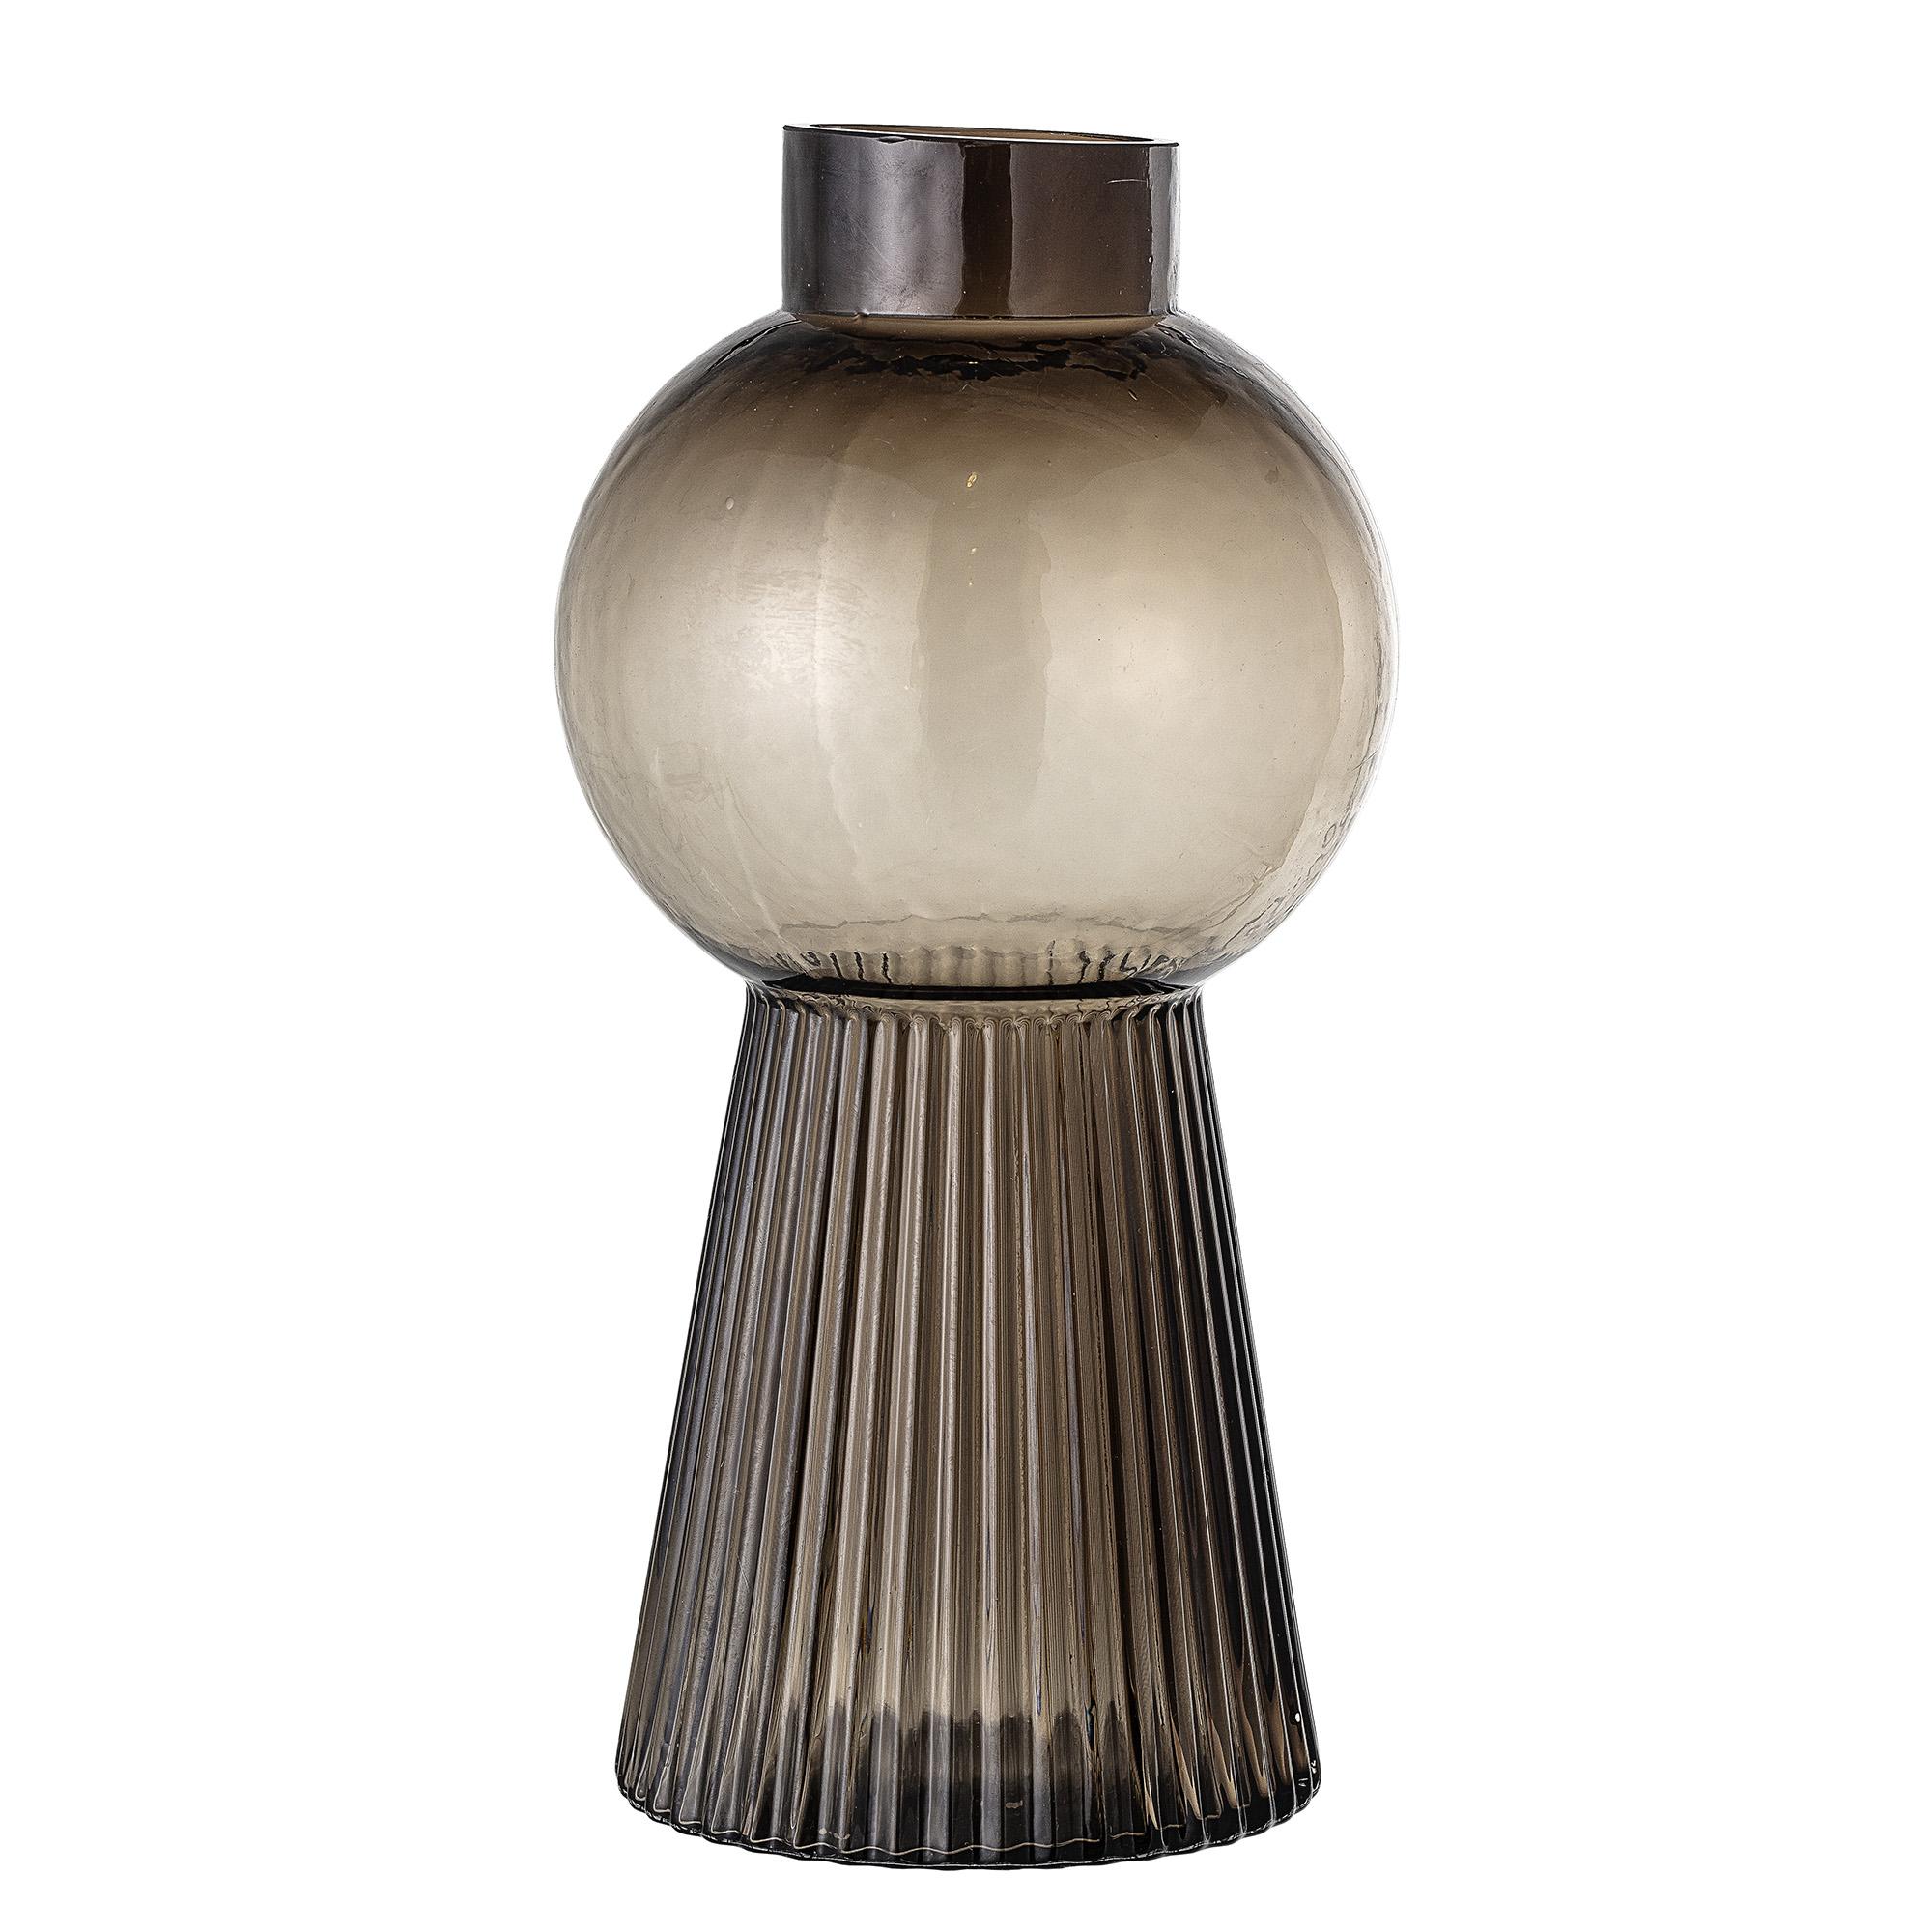 Smoked glass vase - large